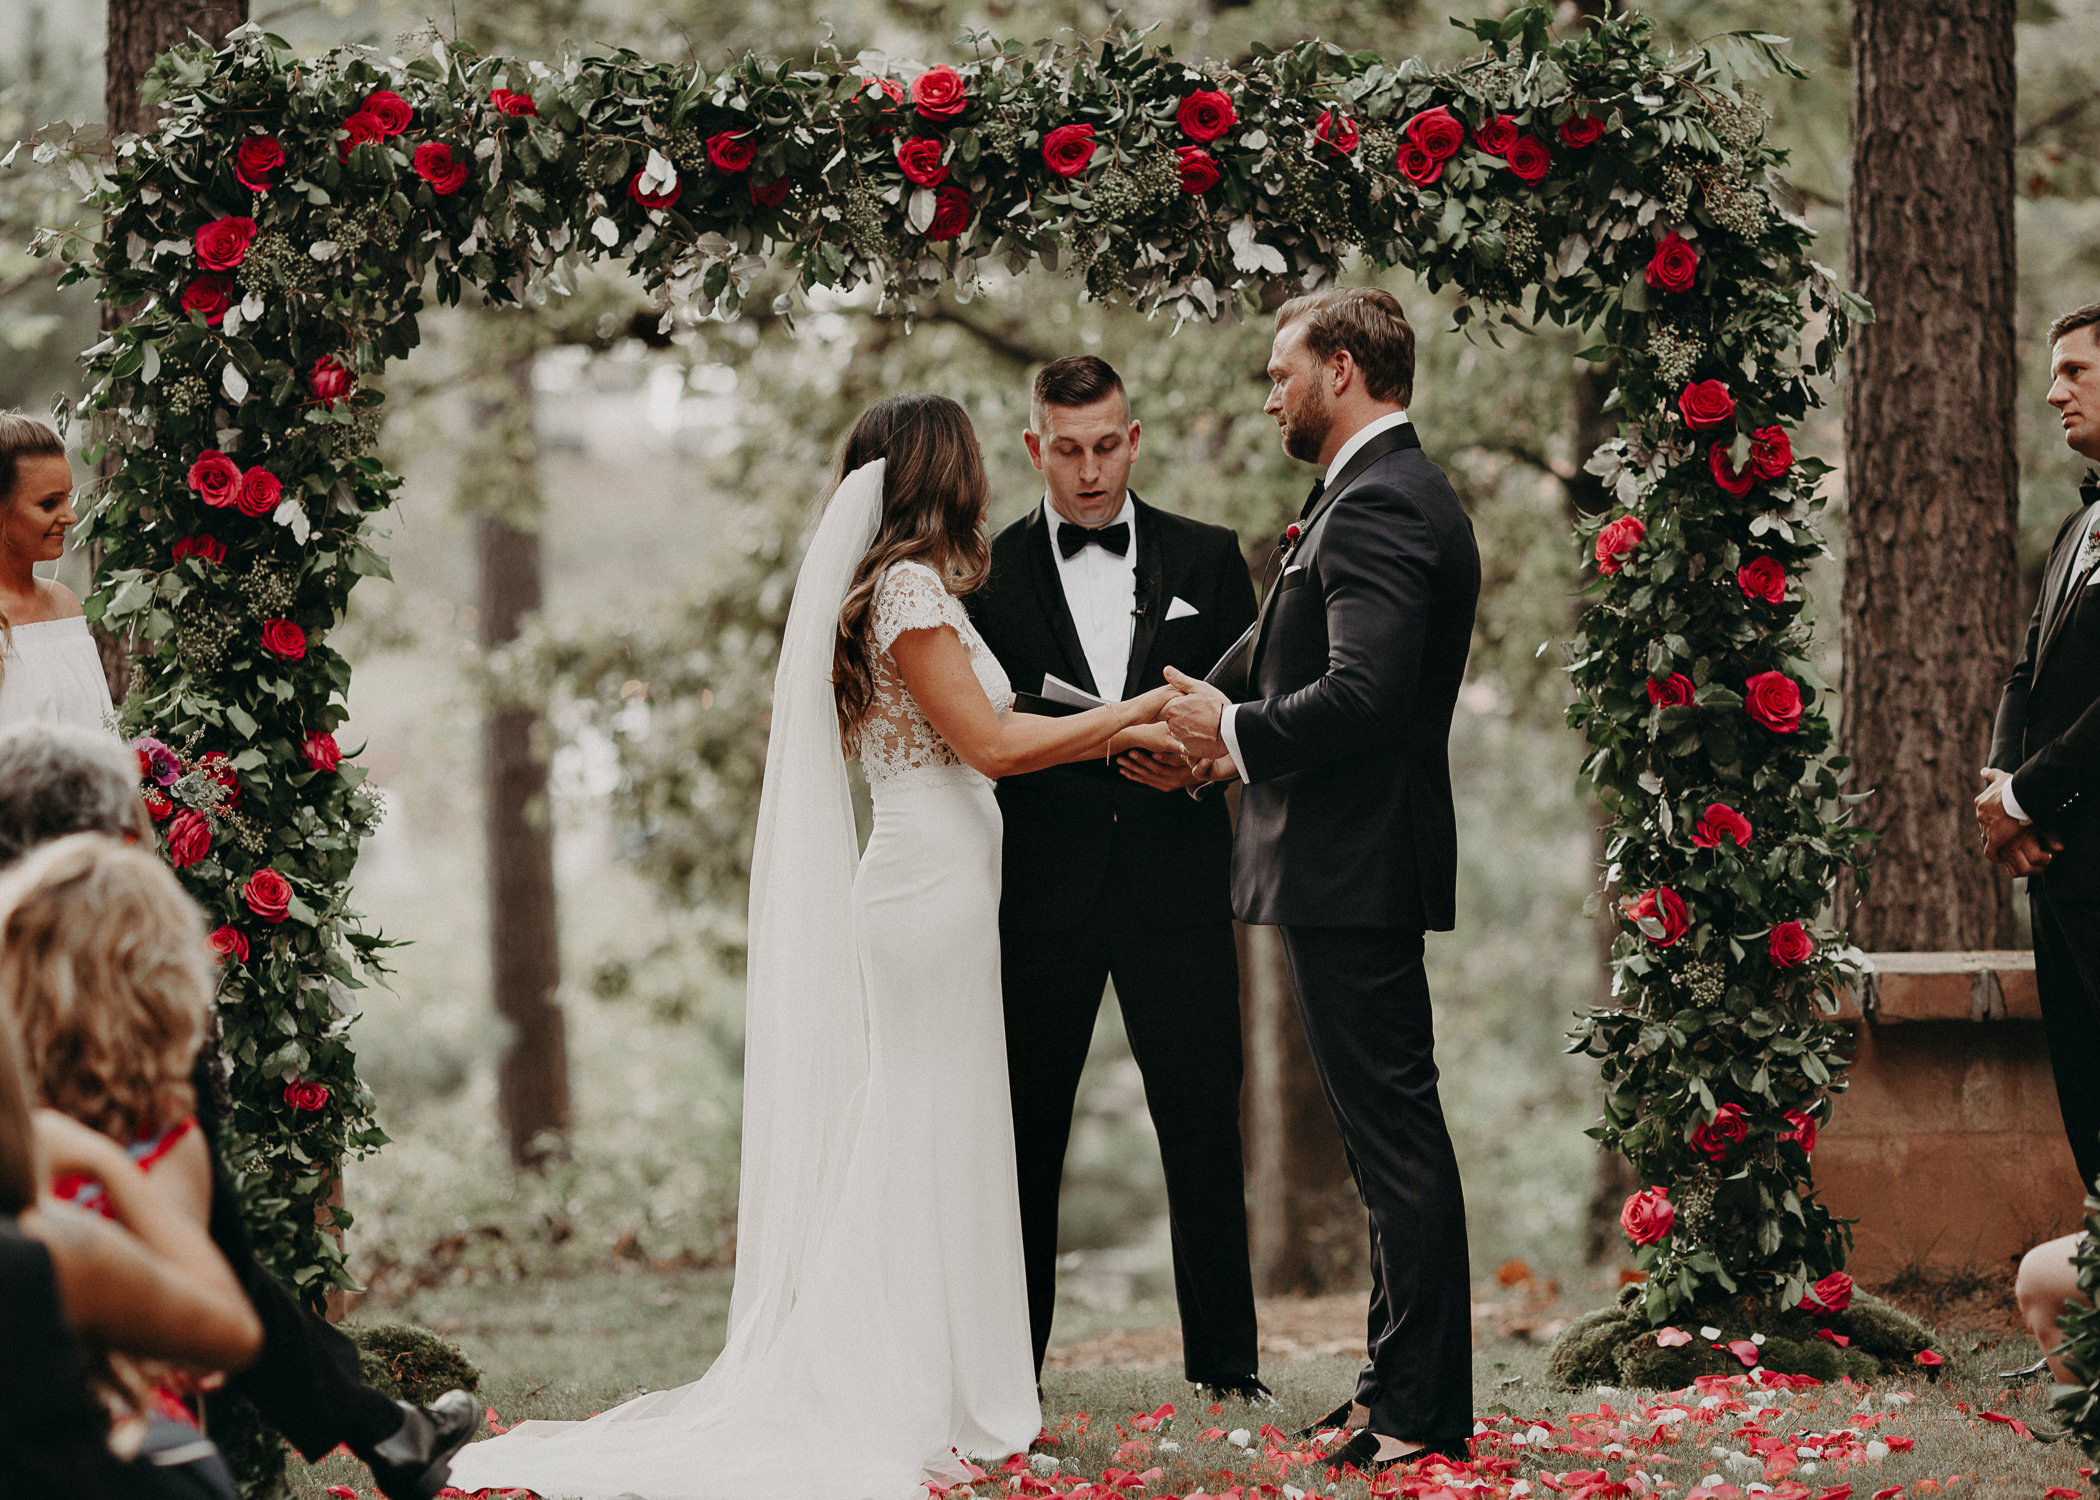 68 - Exchange of vows at wedding ceremony at serenbi farms atlanta .jpg